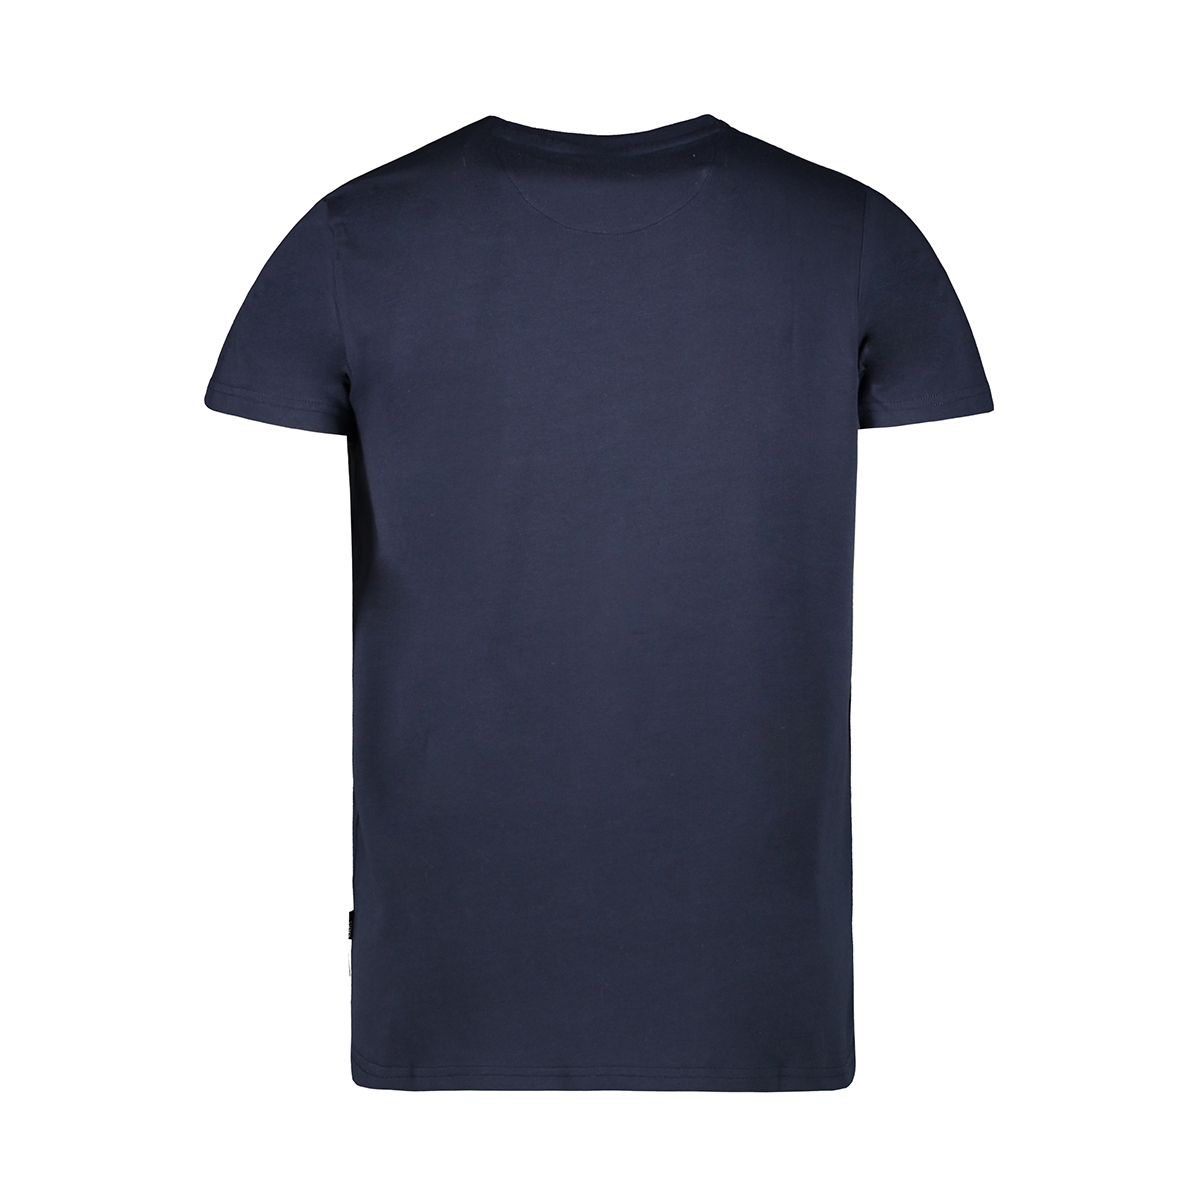 fulton ts 42012 cars t-shirt 12 navy